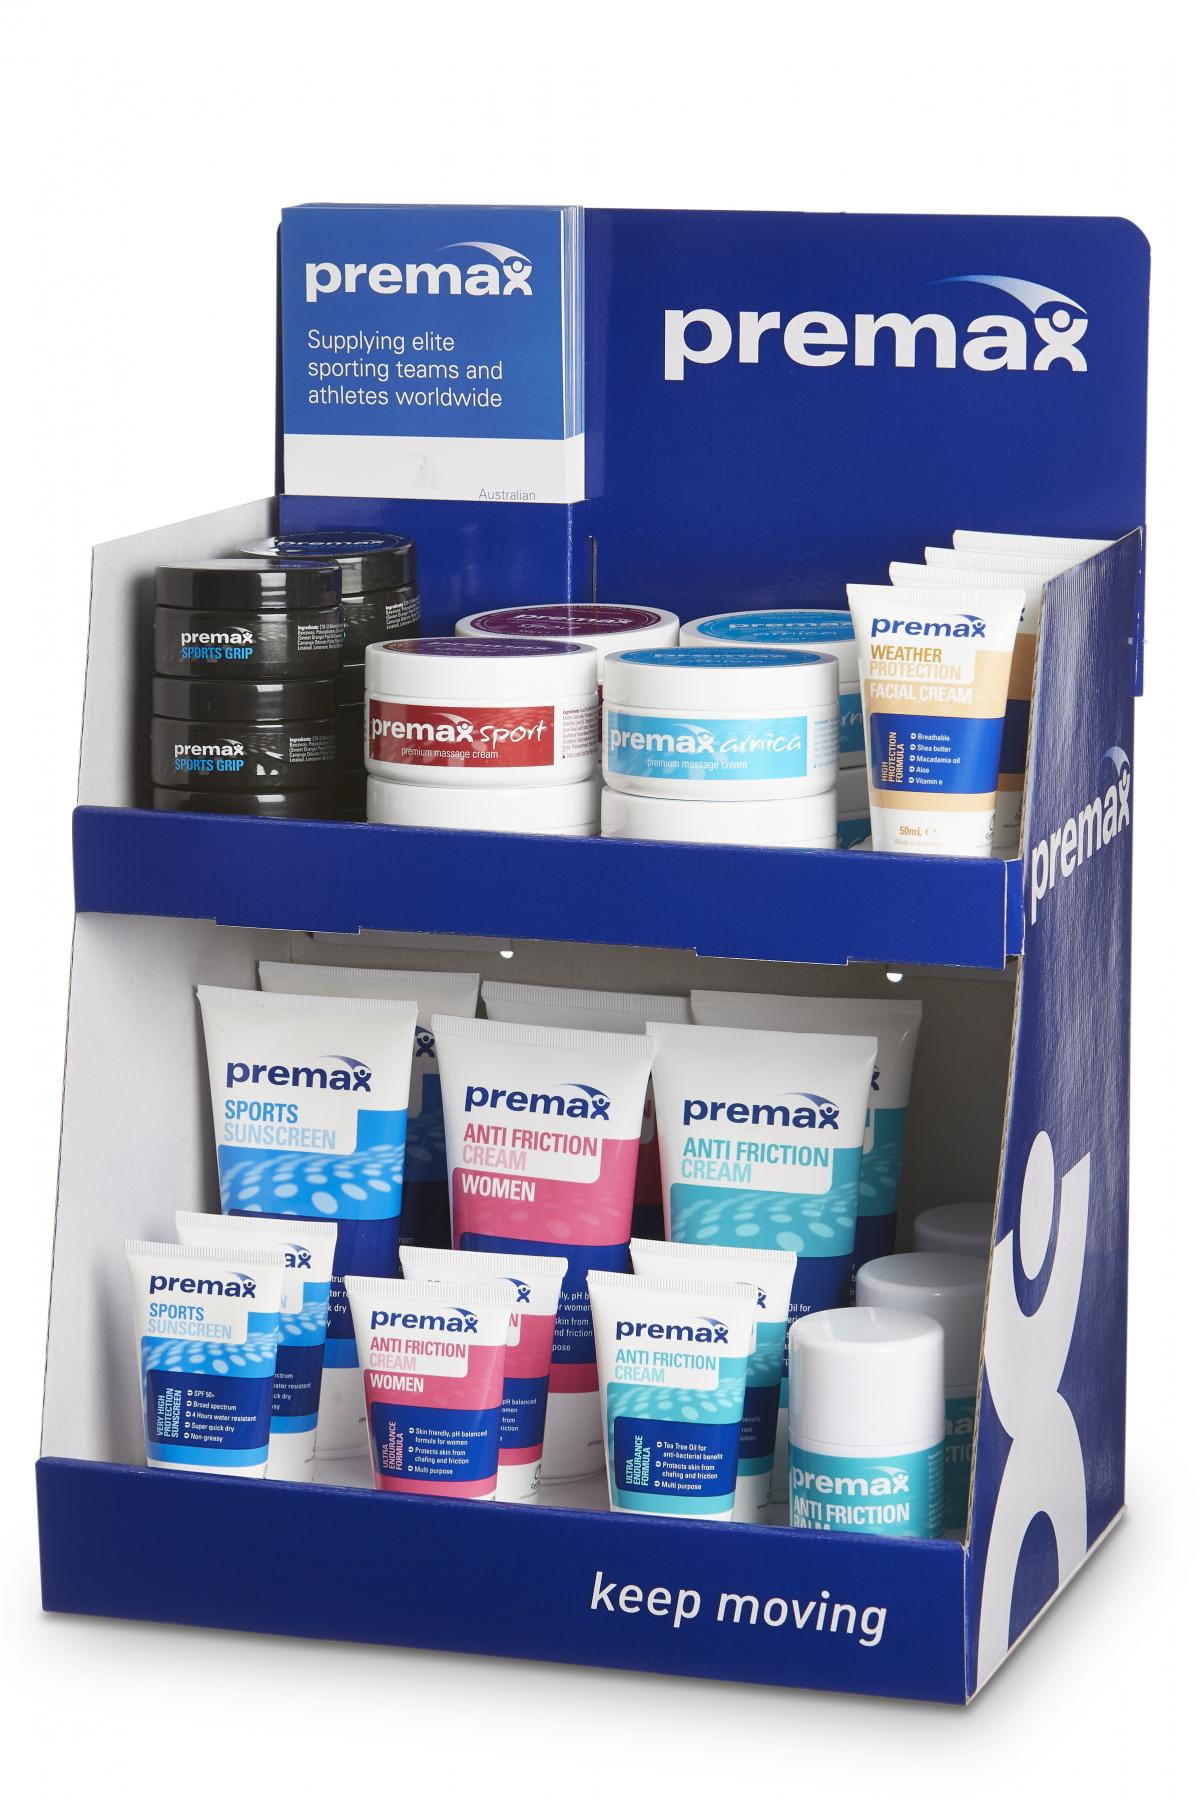 Premax 澳洲原裝 運動用止滑膏住握霜 1